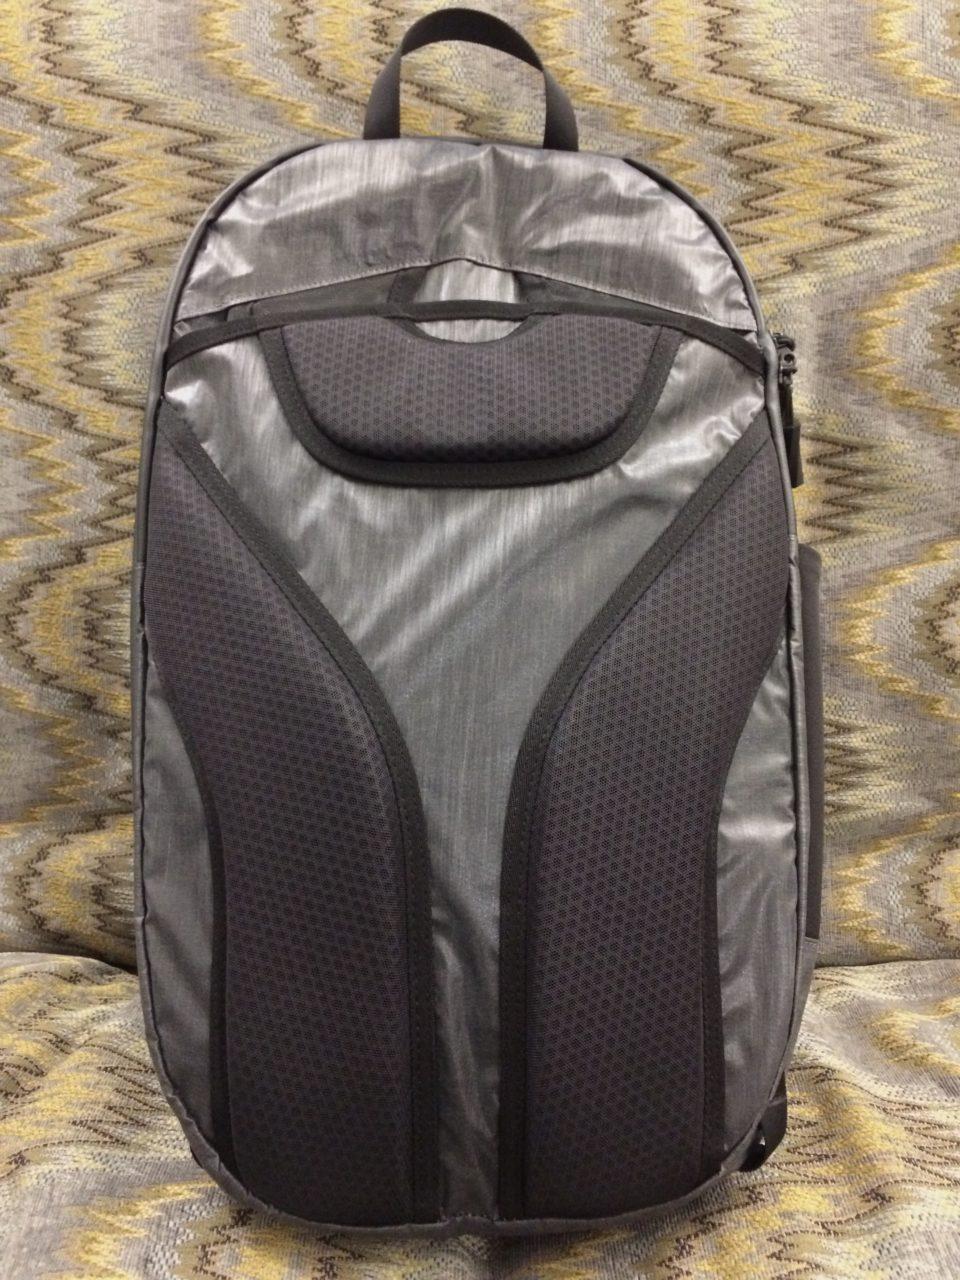 Tortuga Homebase Backpack straps stowed